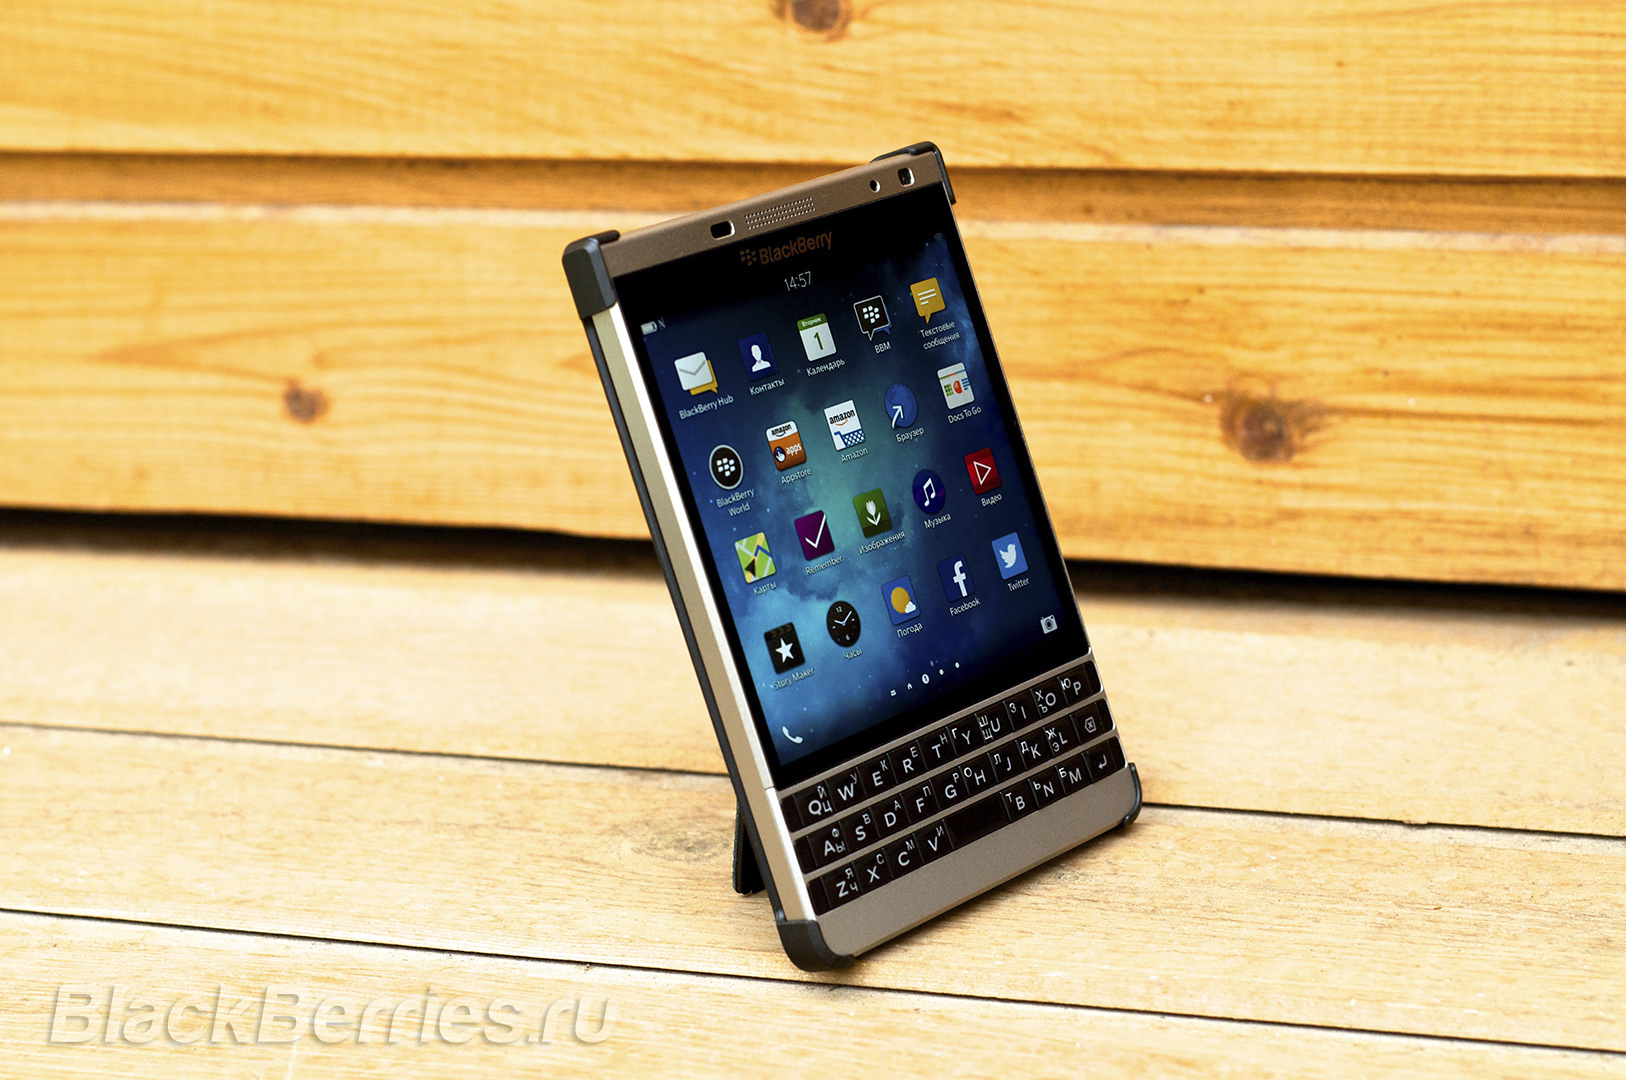 BlackBerry-Passport-Silver-Edition-Cases-06